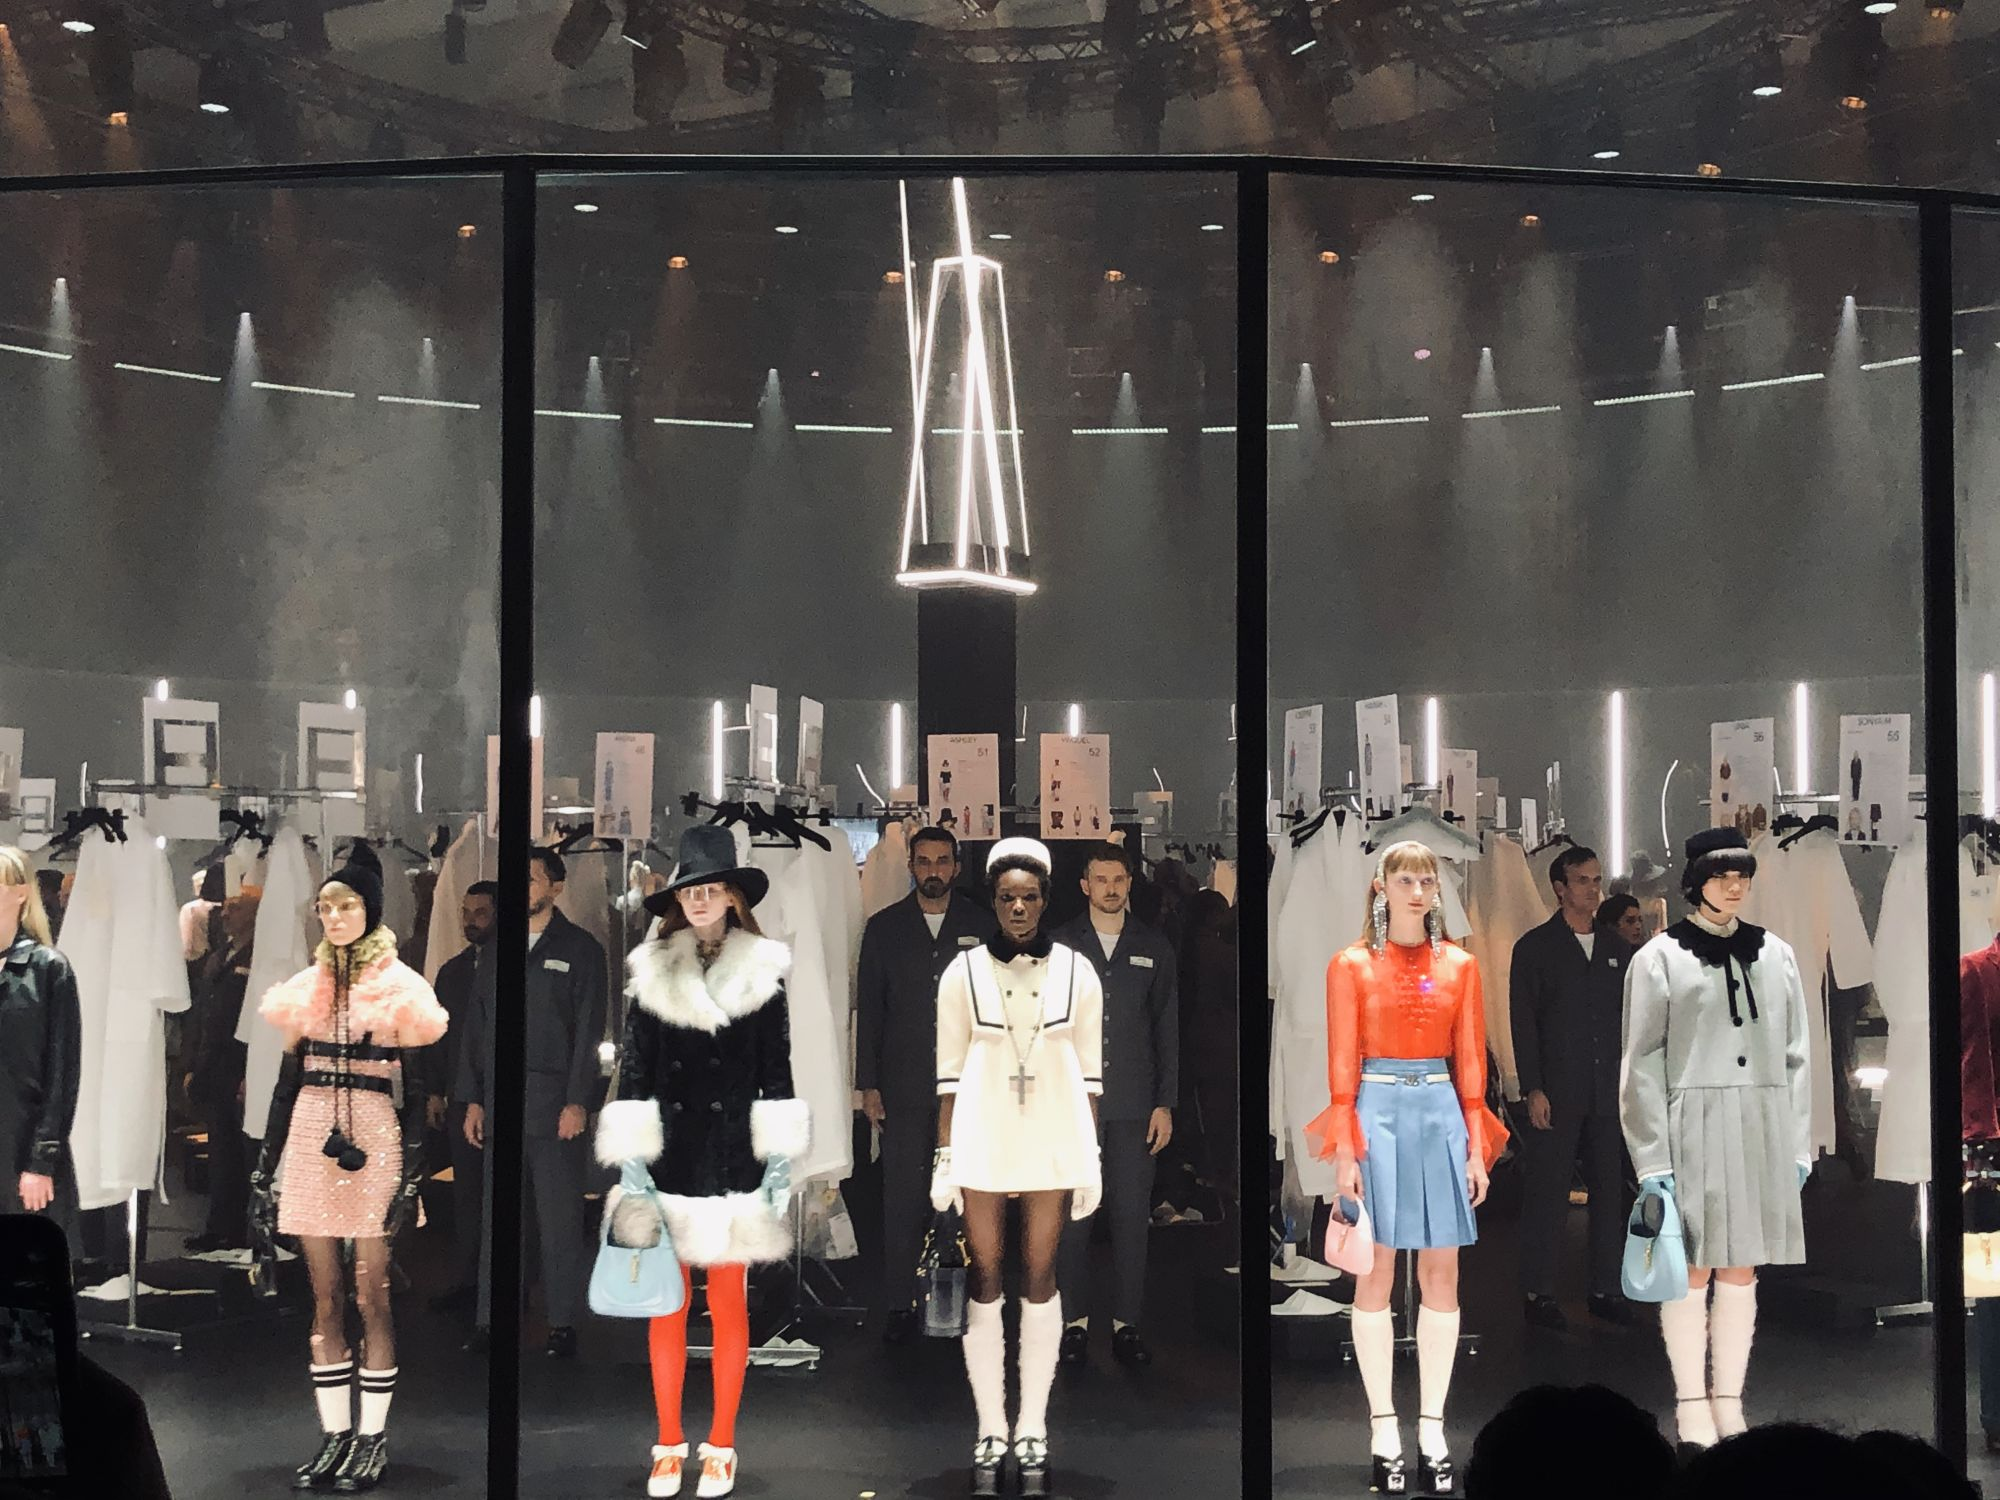 Milan Fashion Week Fall/Winter 2020: Day 1 Highlights